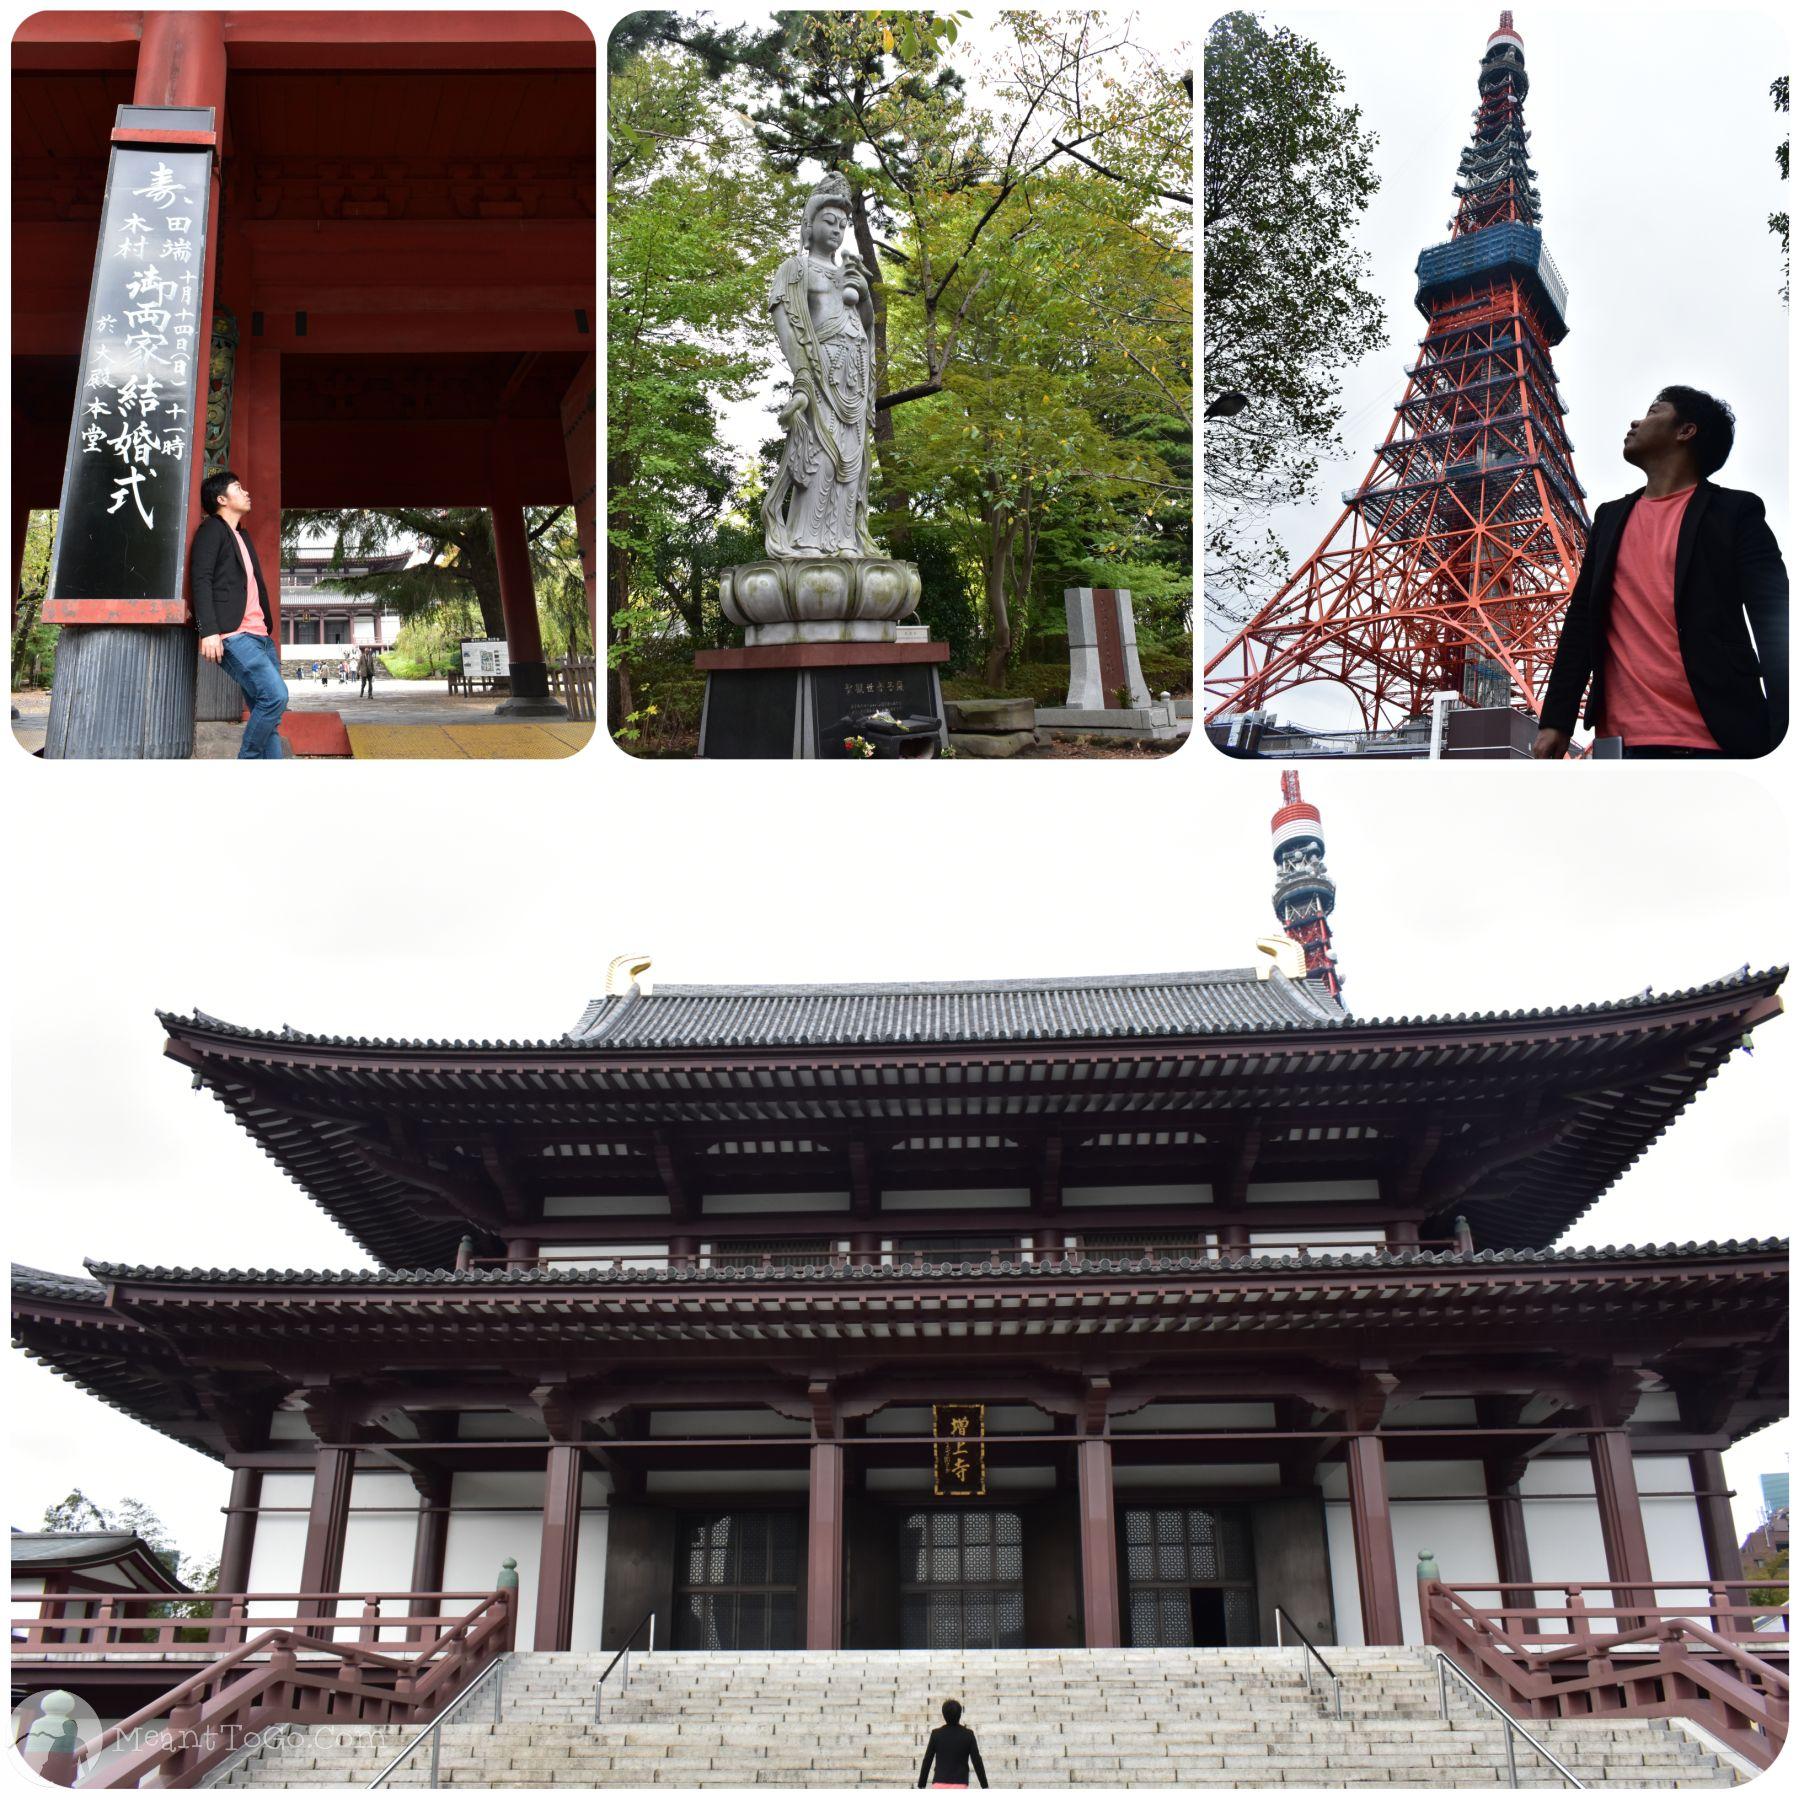 Minato - Tokyo Tower, Zojo-ji Temple